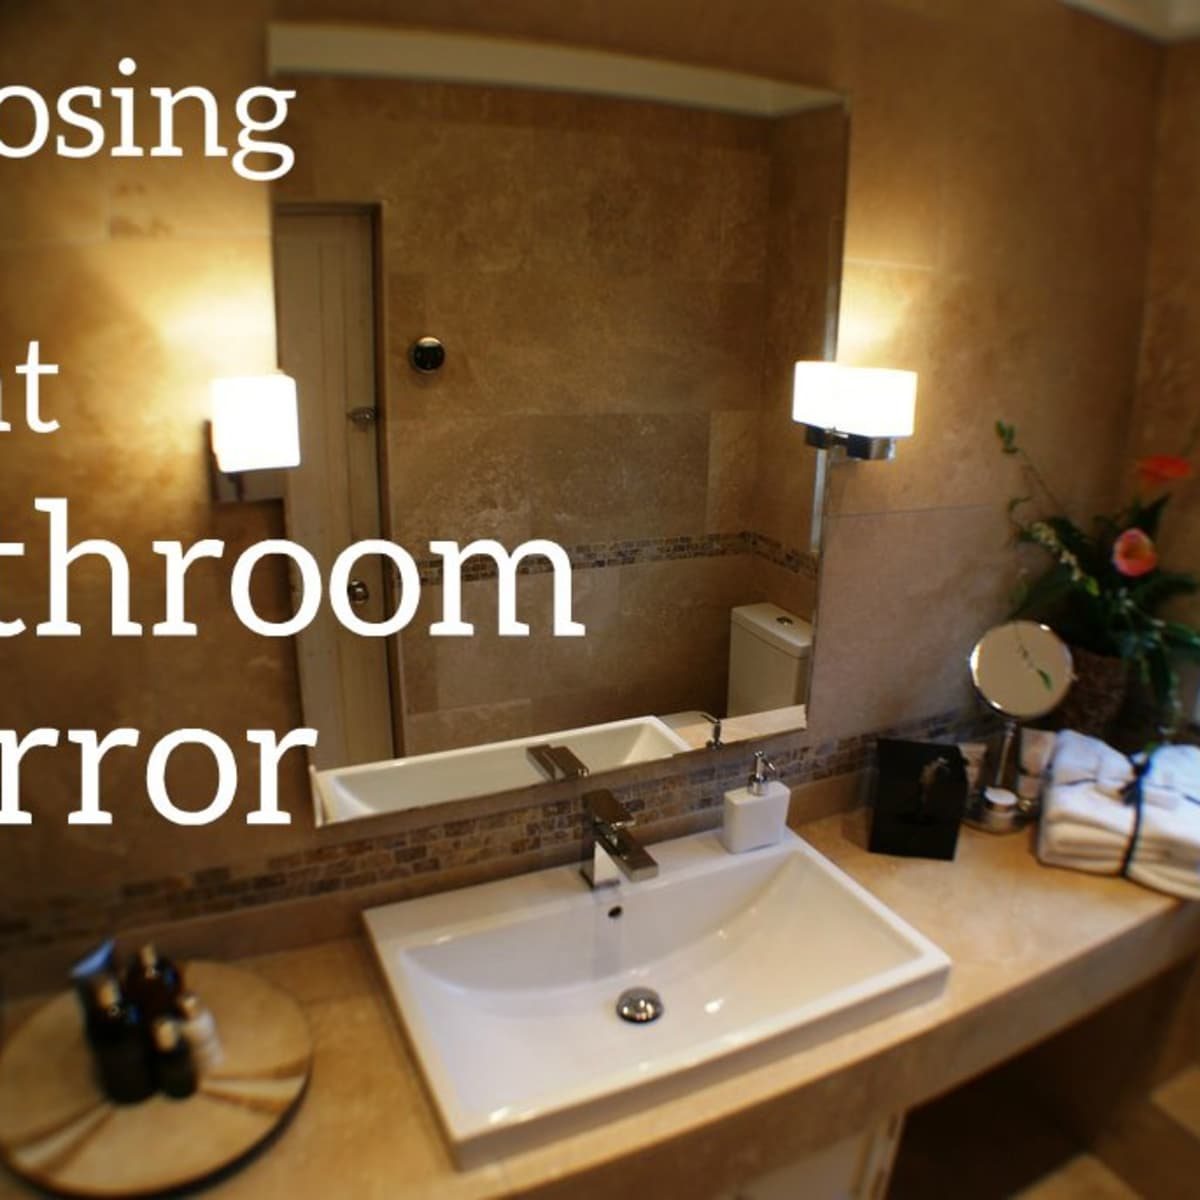 mirror above your bathroom vanity